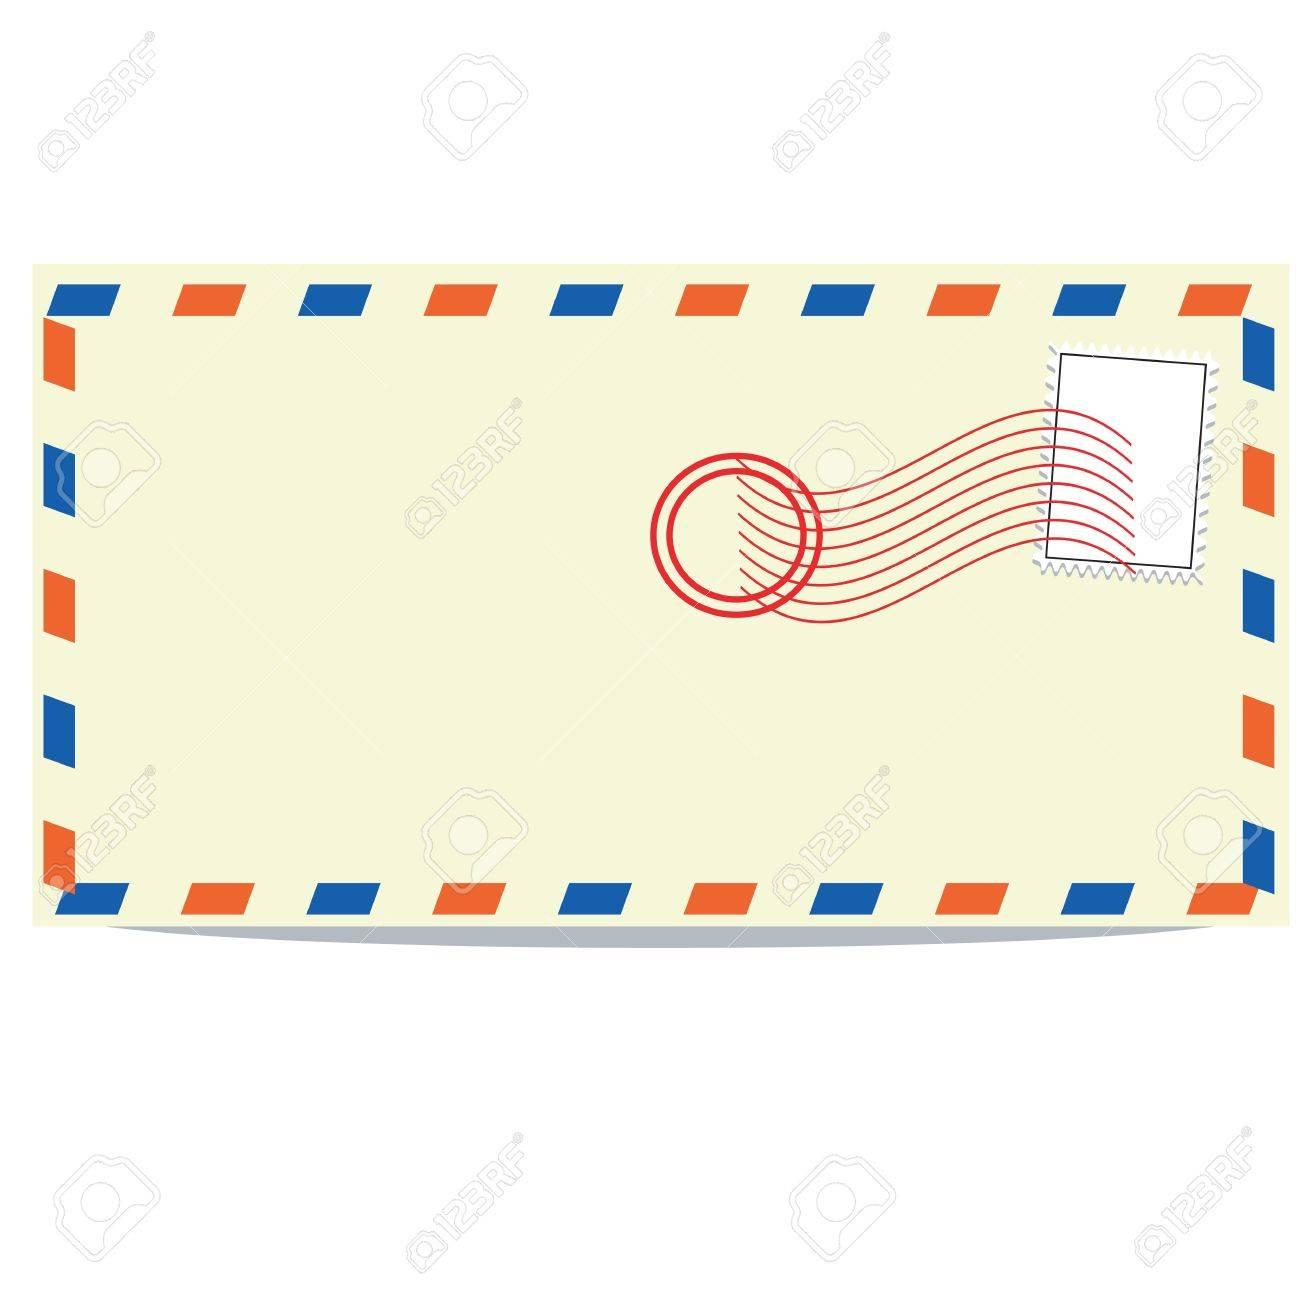 Simple envelope back side wver white background Stock Vector - 11958101